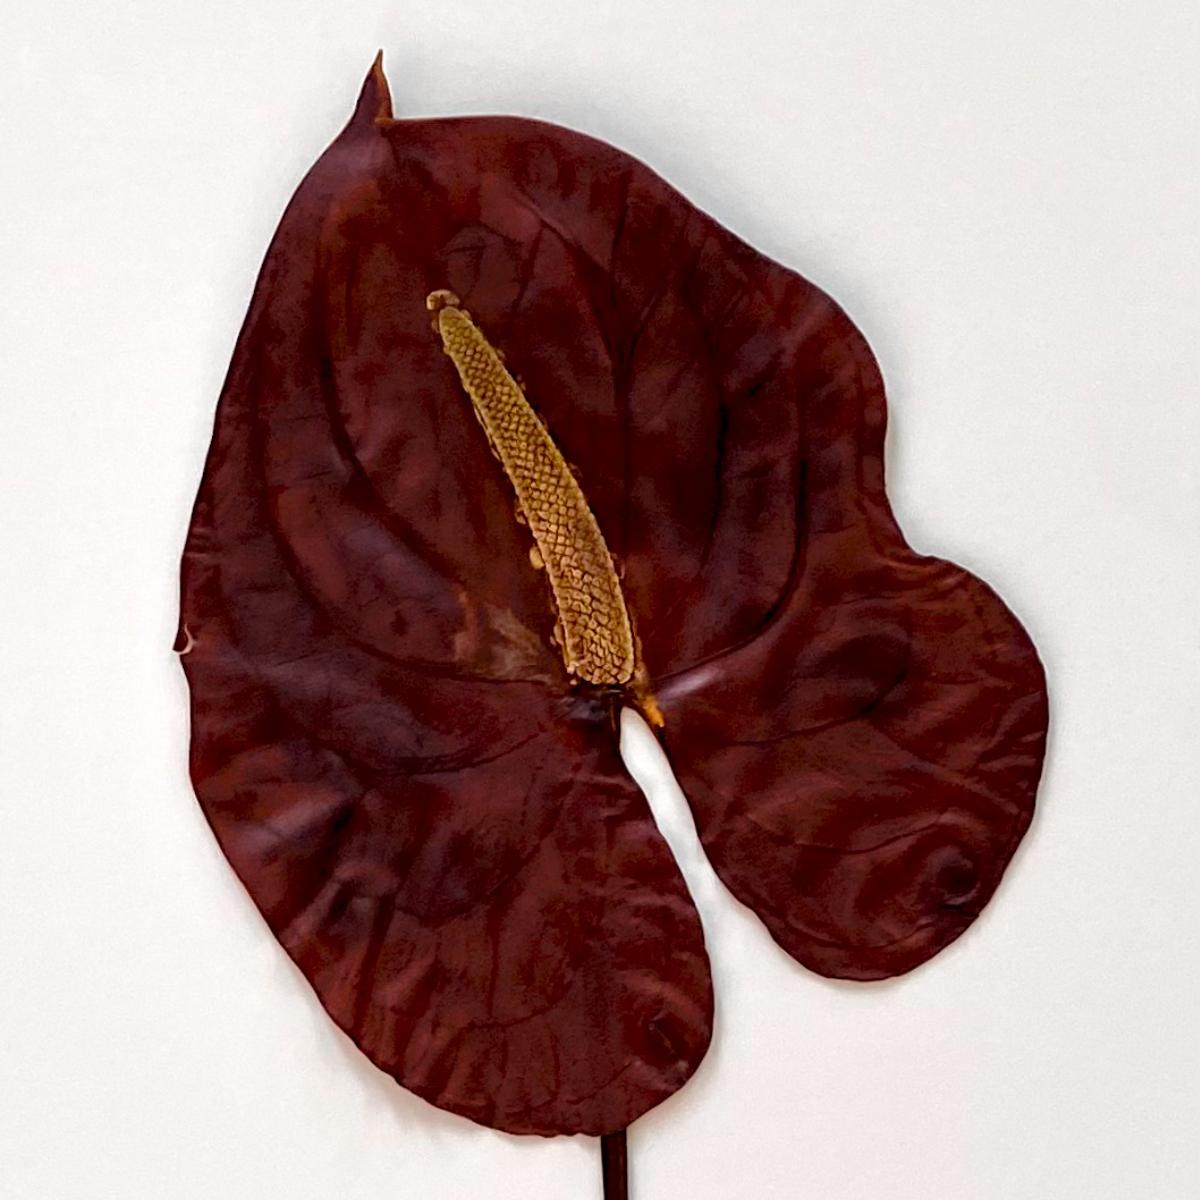 Sabrina Hoelzer Anthurium. Detail from framed plate 50 x70 cm